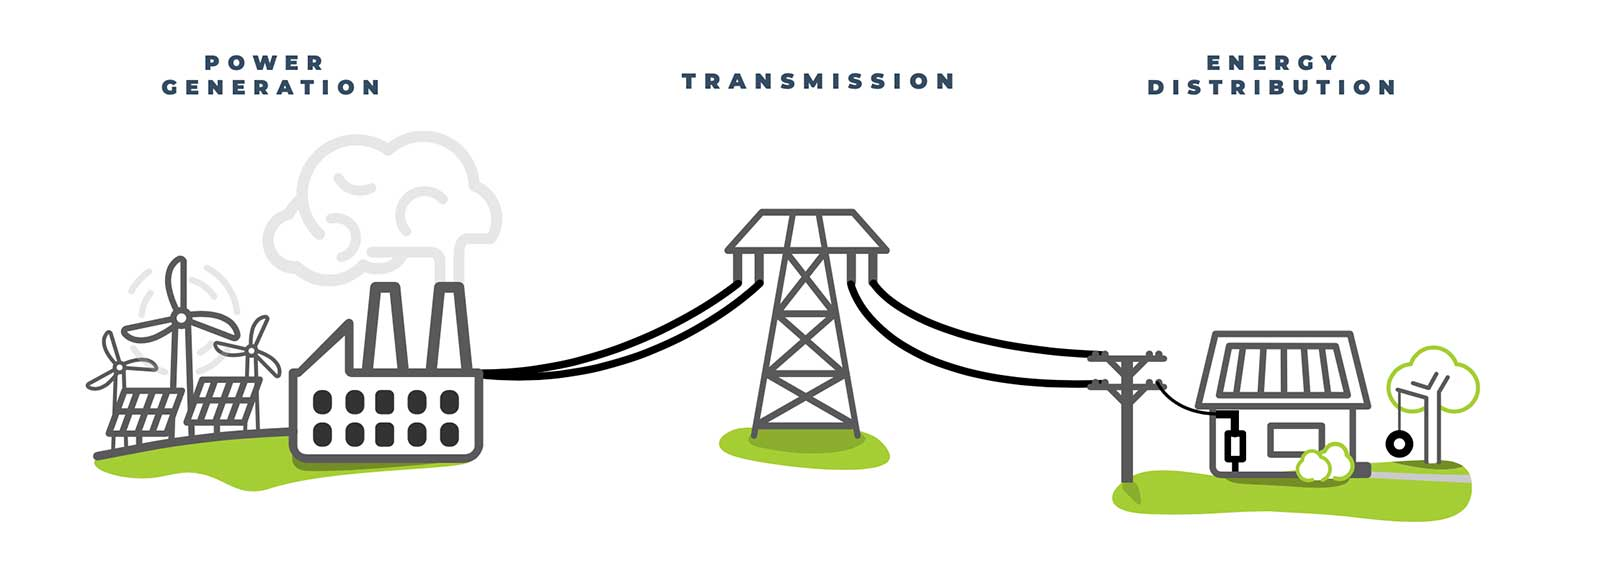 Illustration Energy generation, transmission and distribution, education, EnerWisely